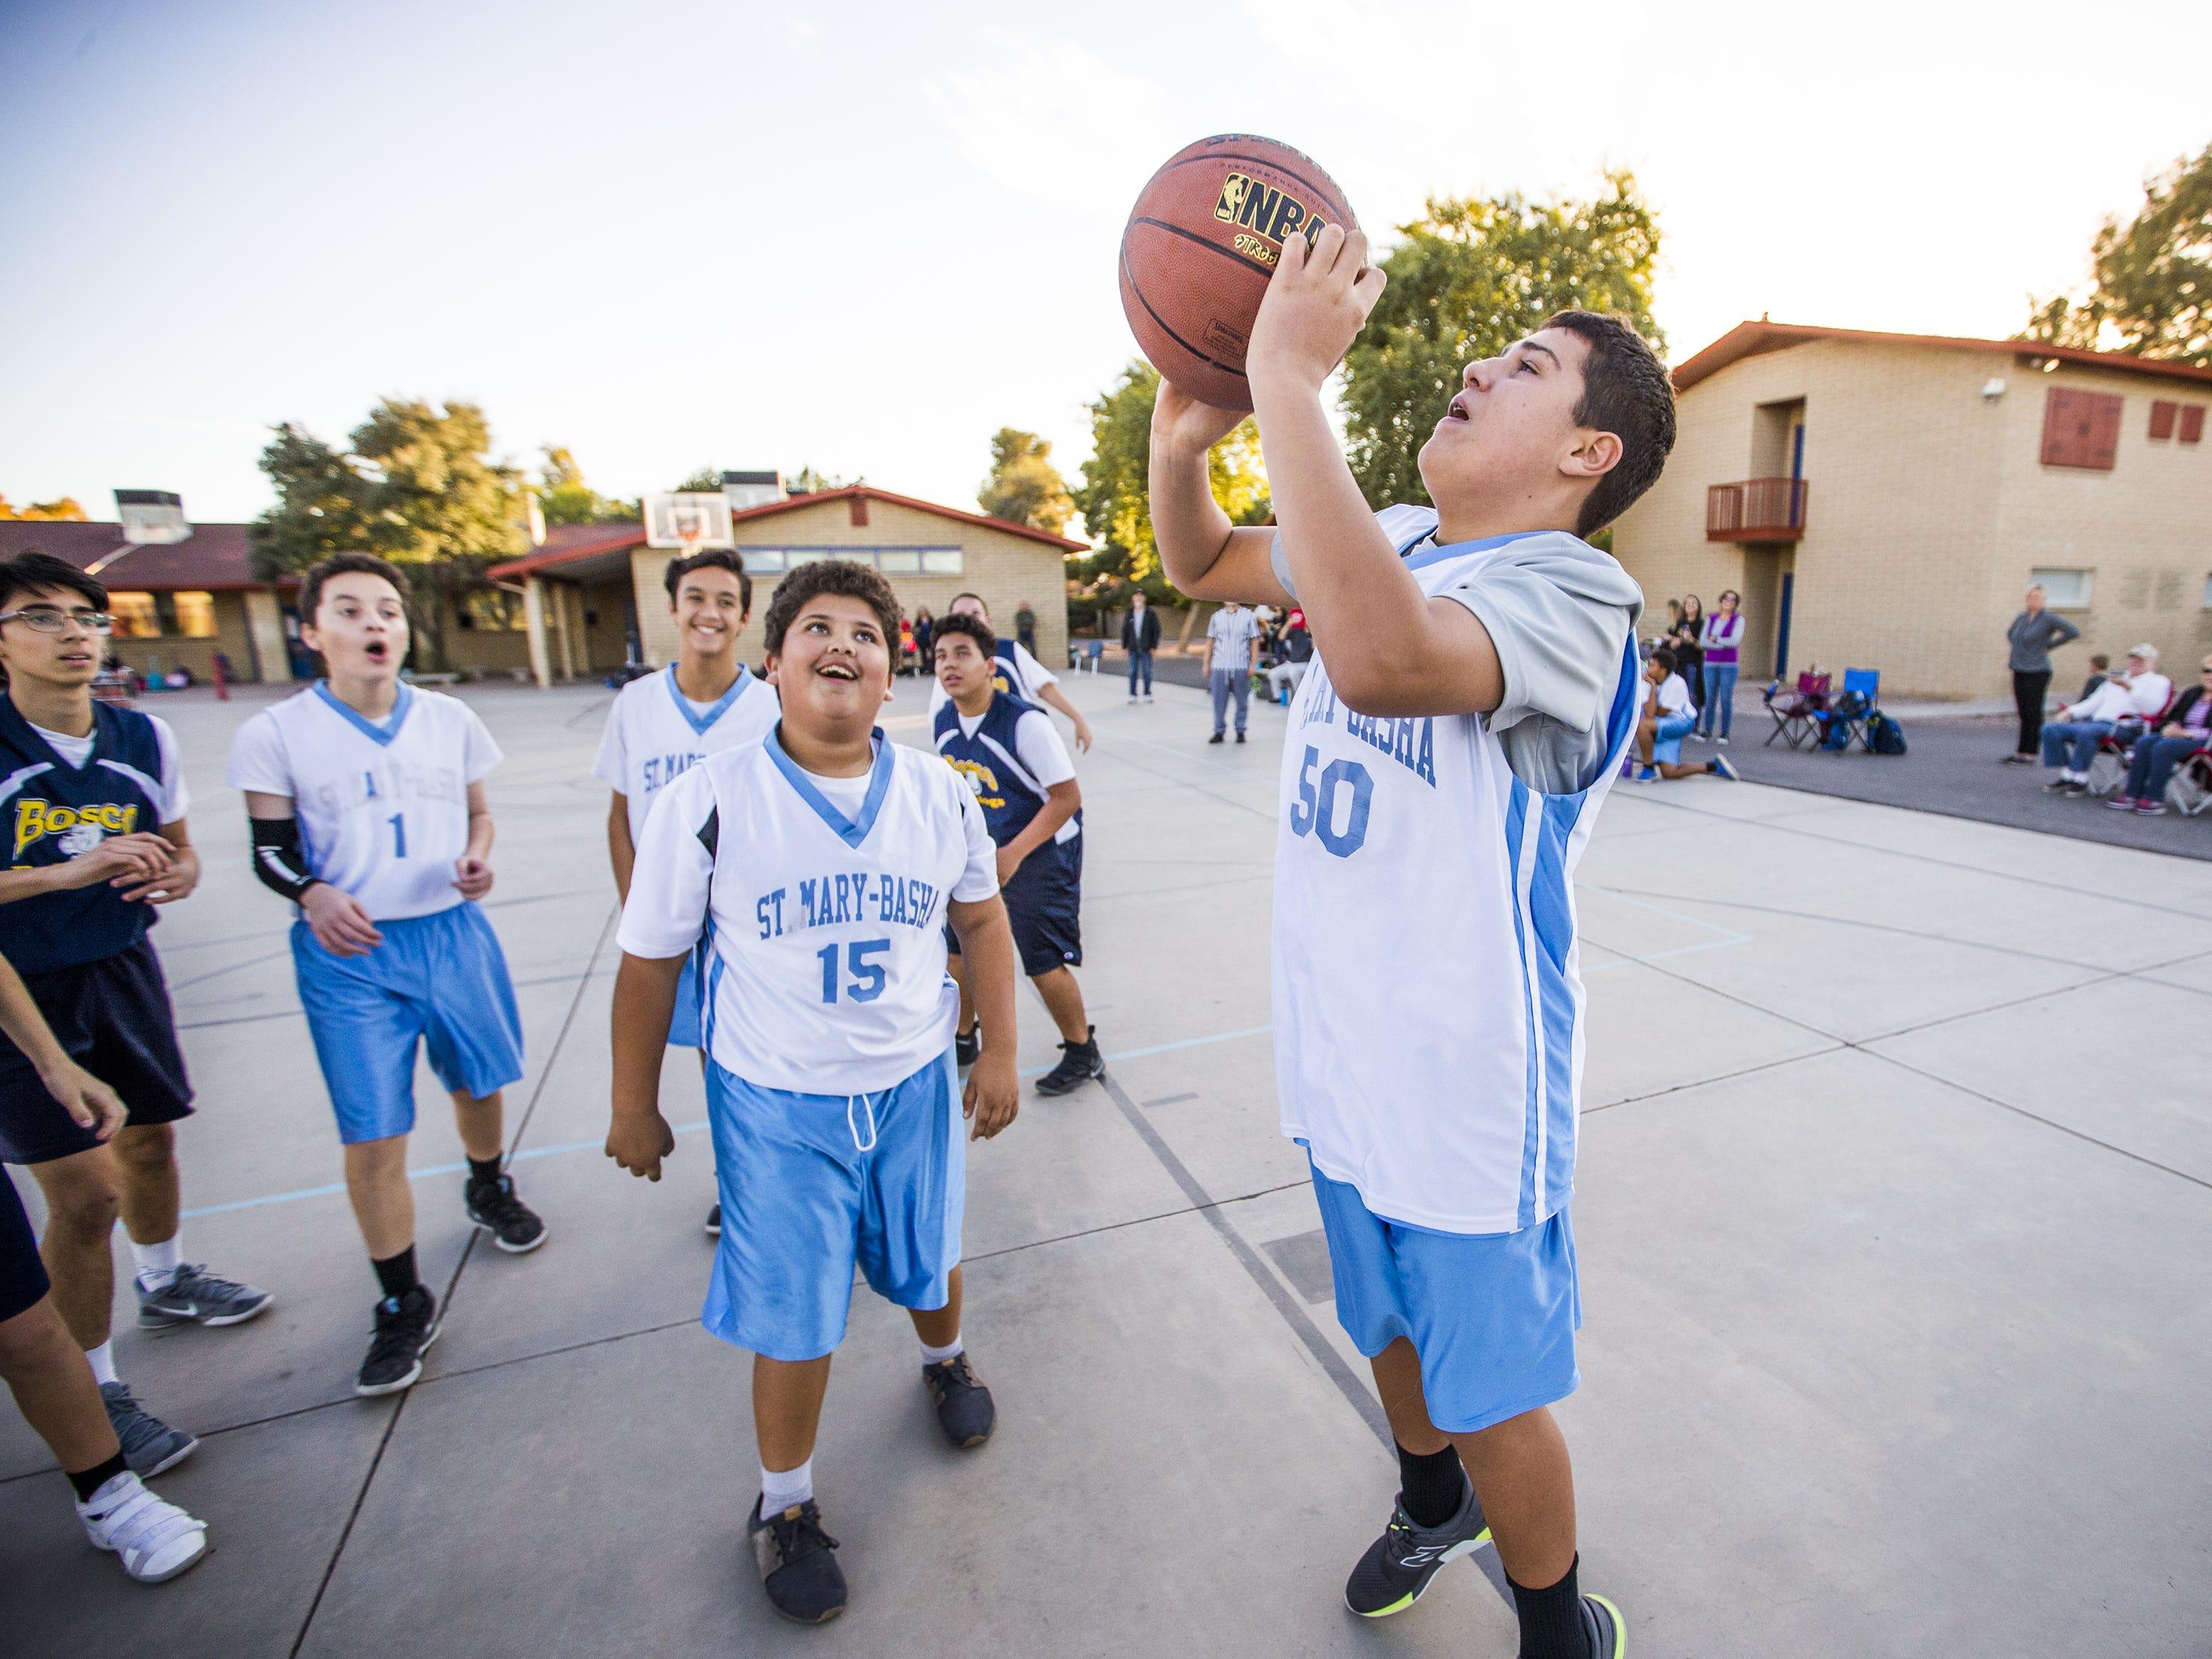 Luke Stockstad, who has autism, takes a shot on basket for his team, St. Mary-Basha Catholic School, as they play St. John Bosco, Tuesday, November 27, 2018.